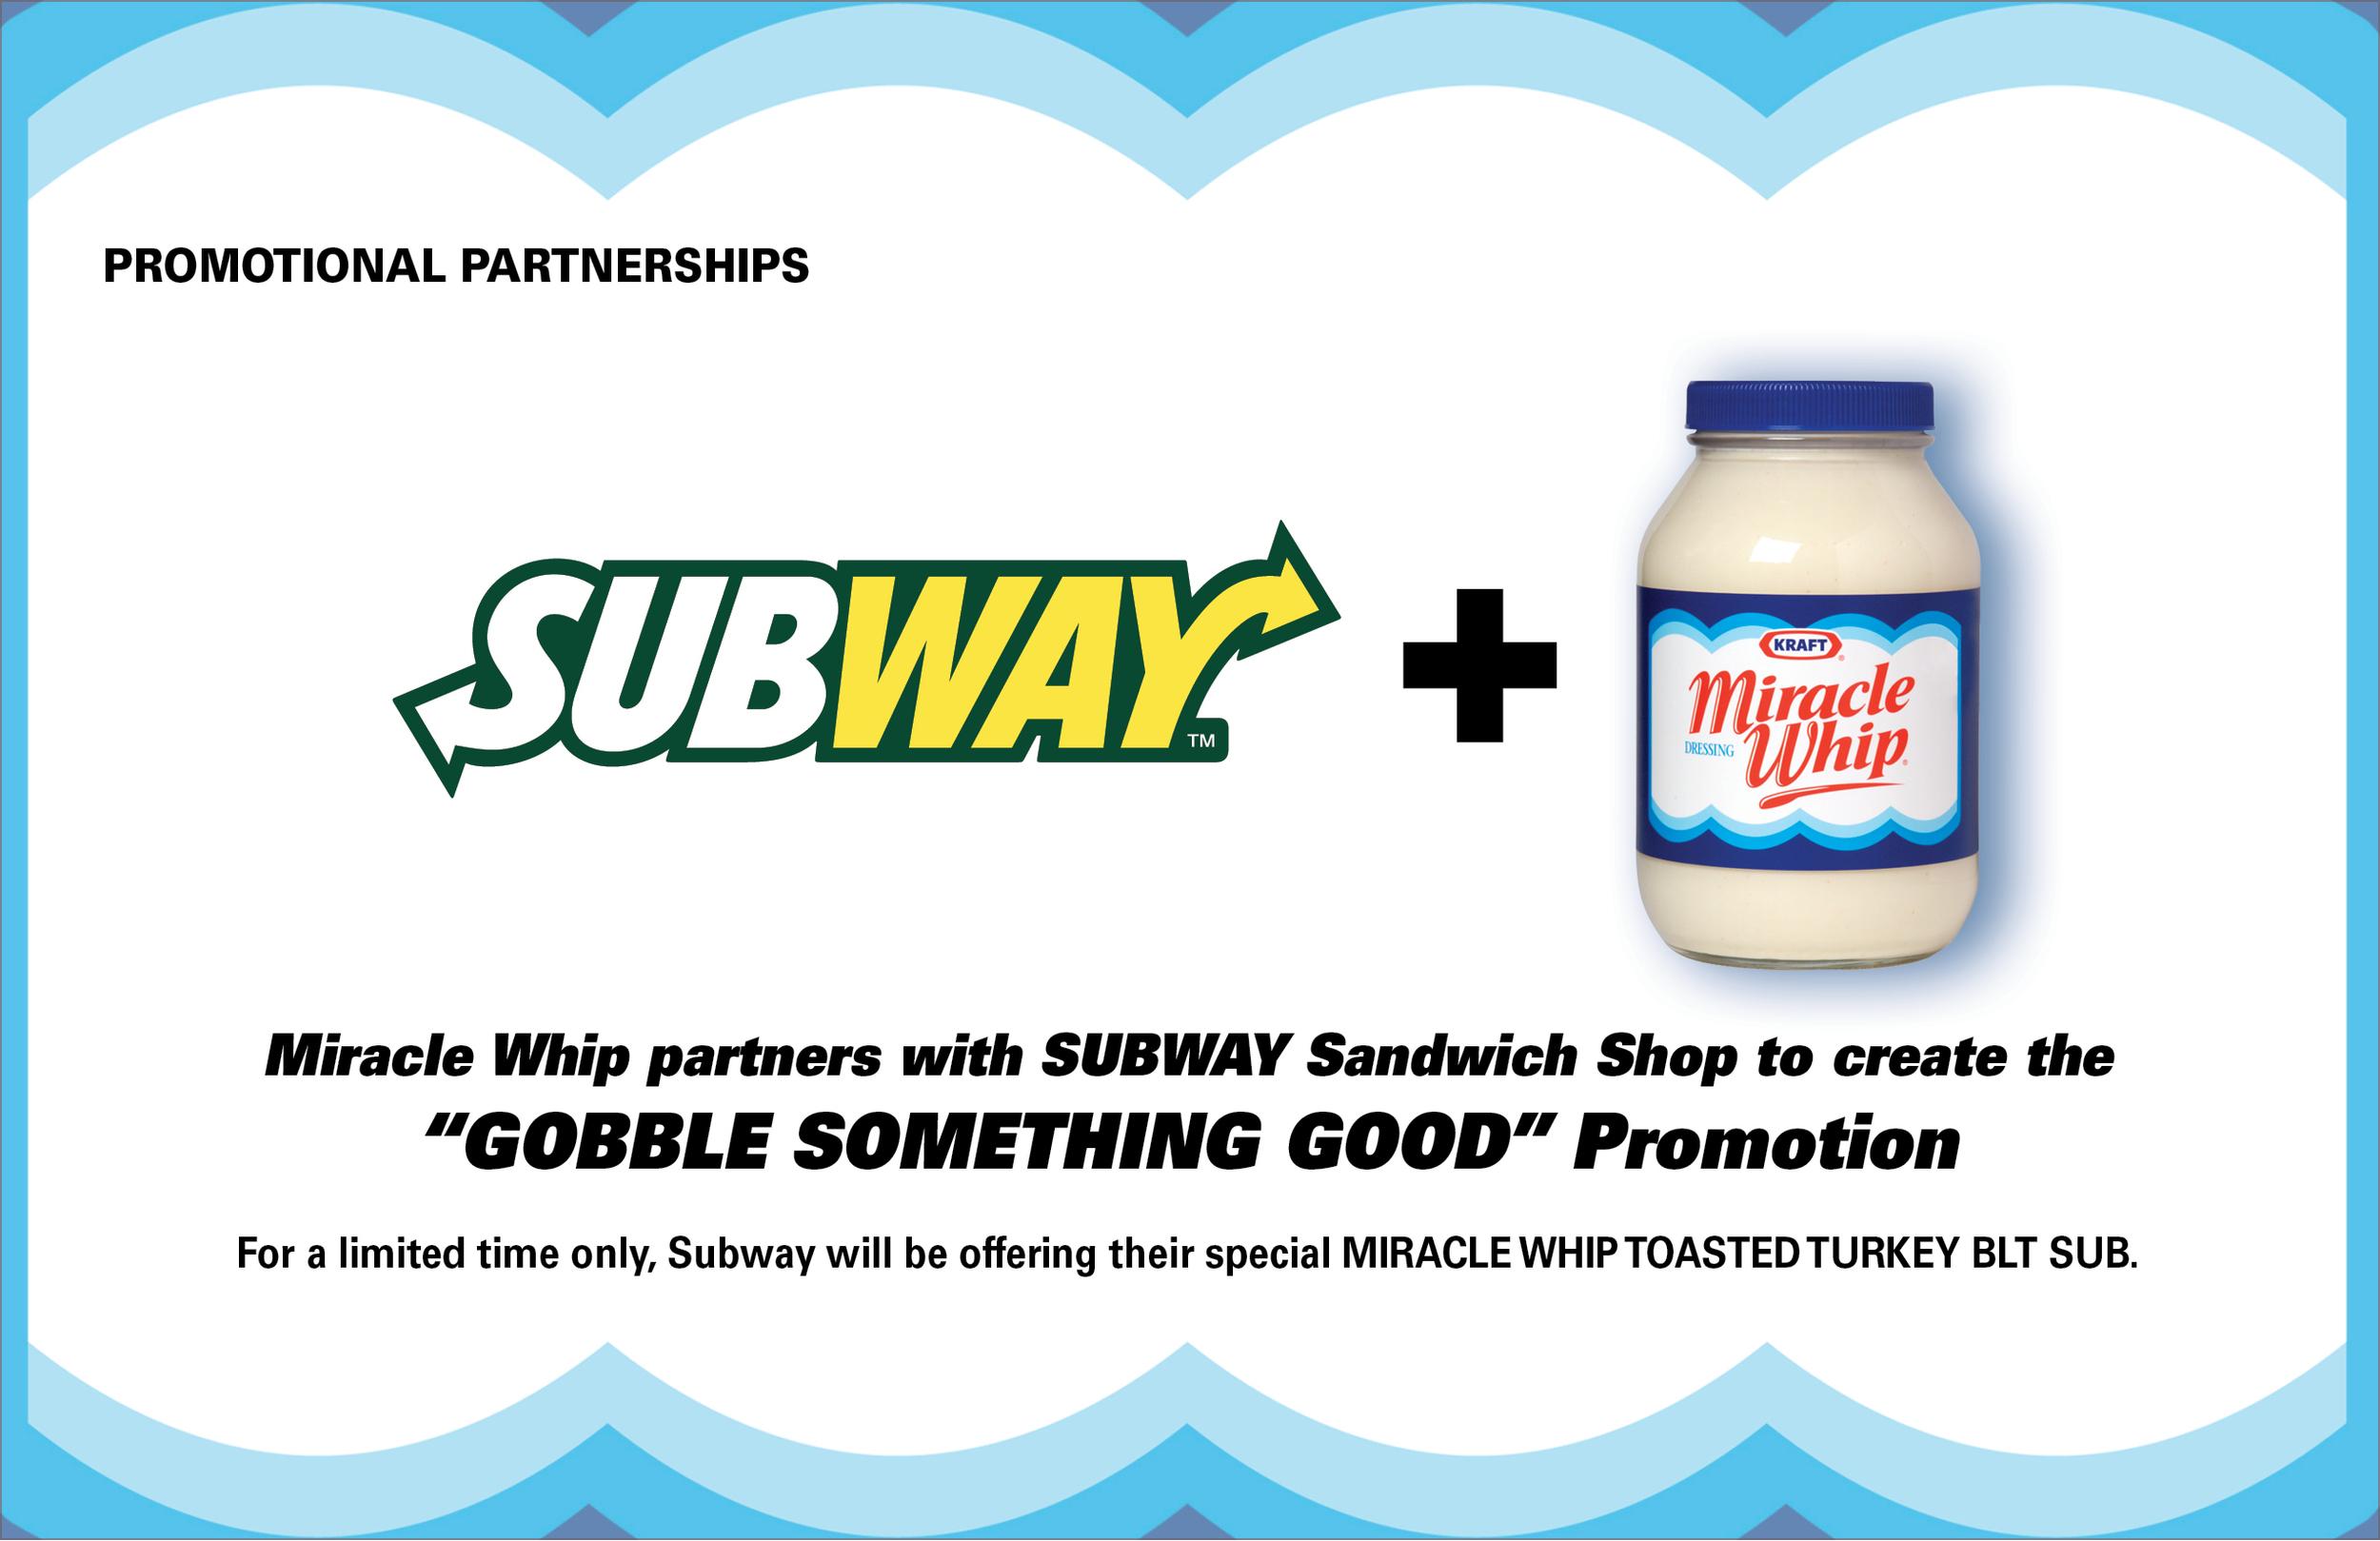 MW+Subway_promo.jpg